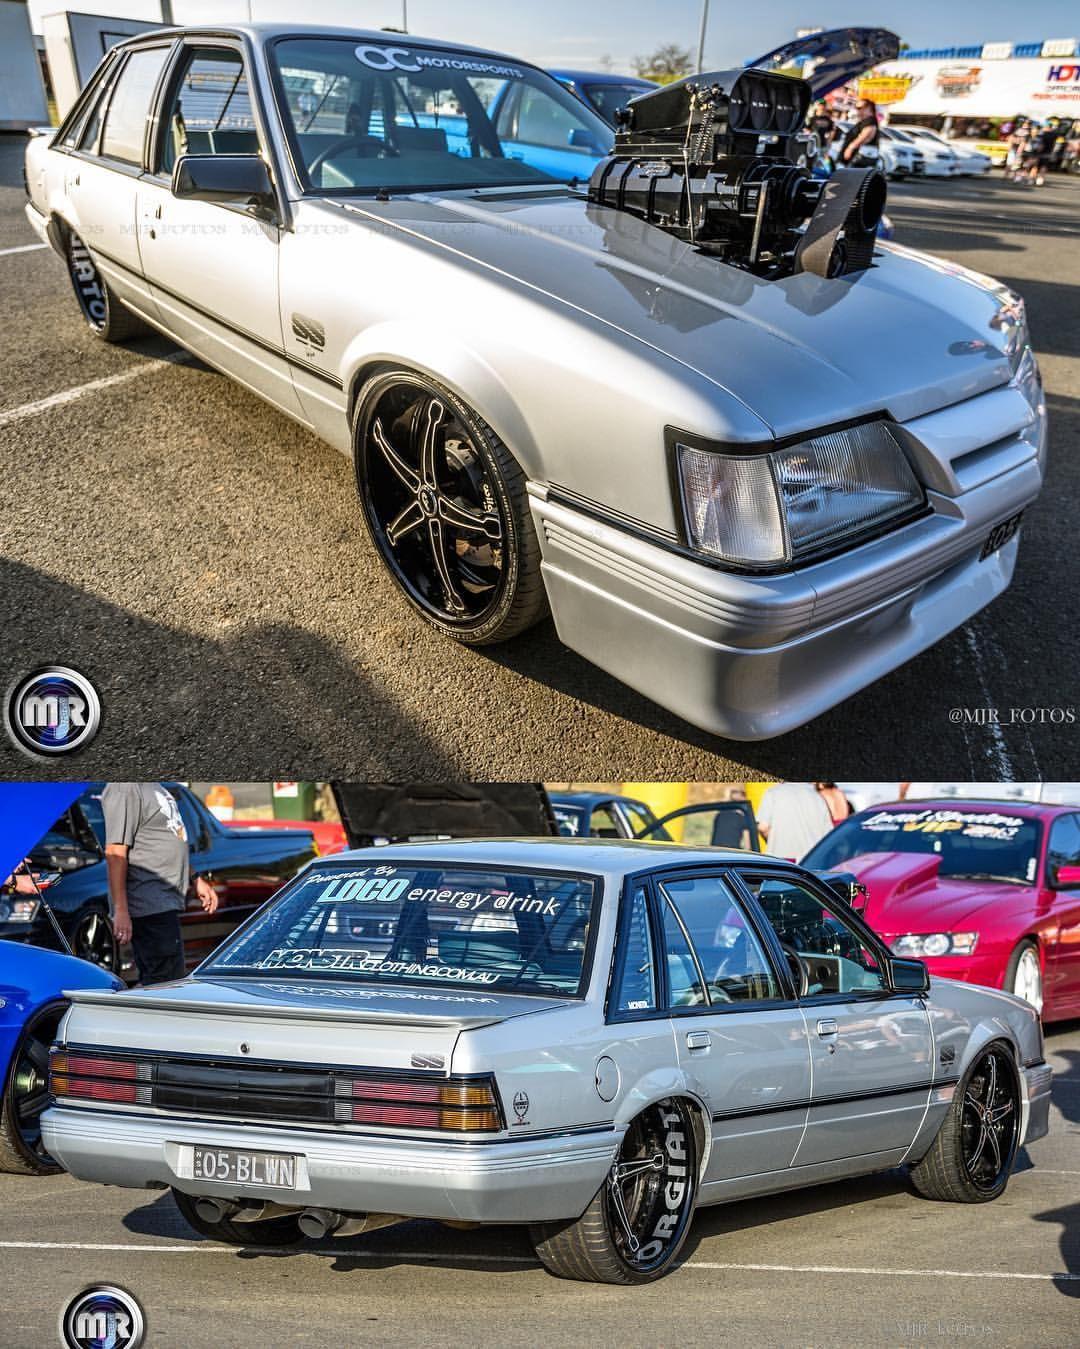 Holden Car Wallpaper: Aussie Muscle Cars, Cars